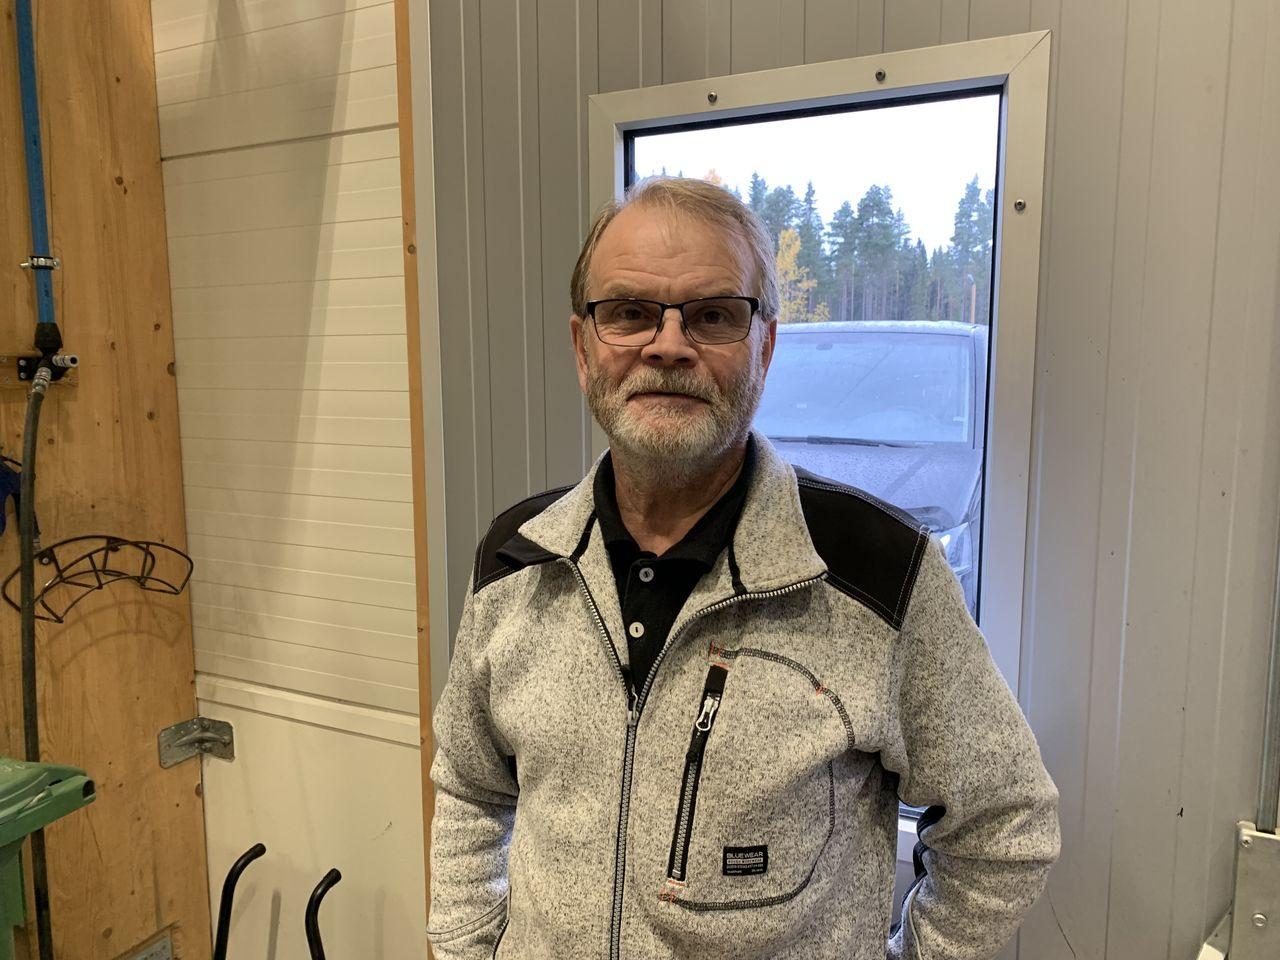 Peo Gudmundsson